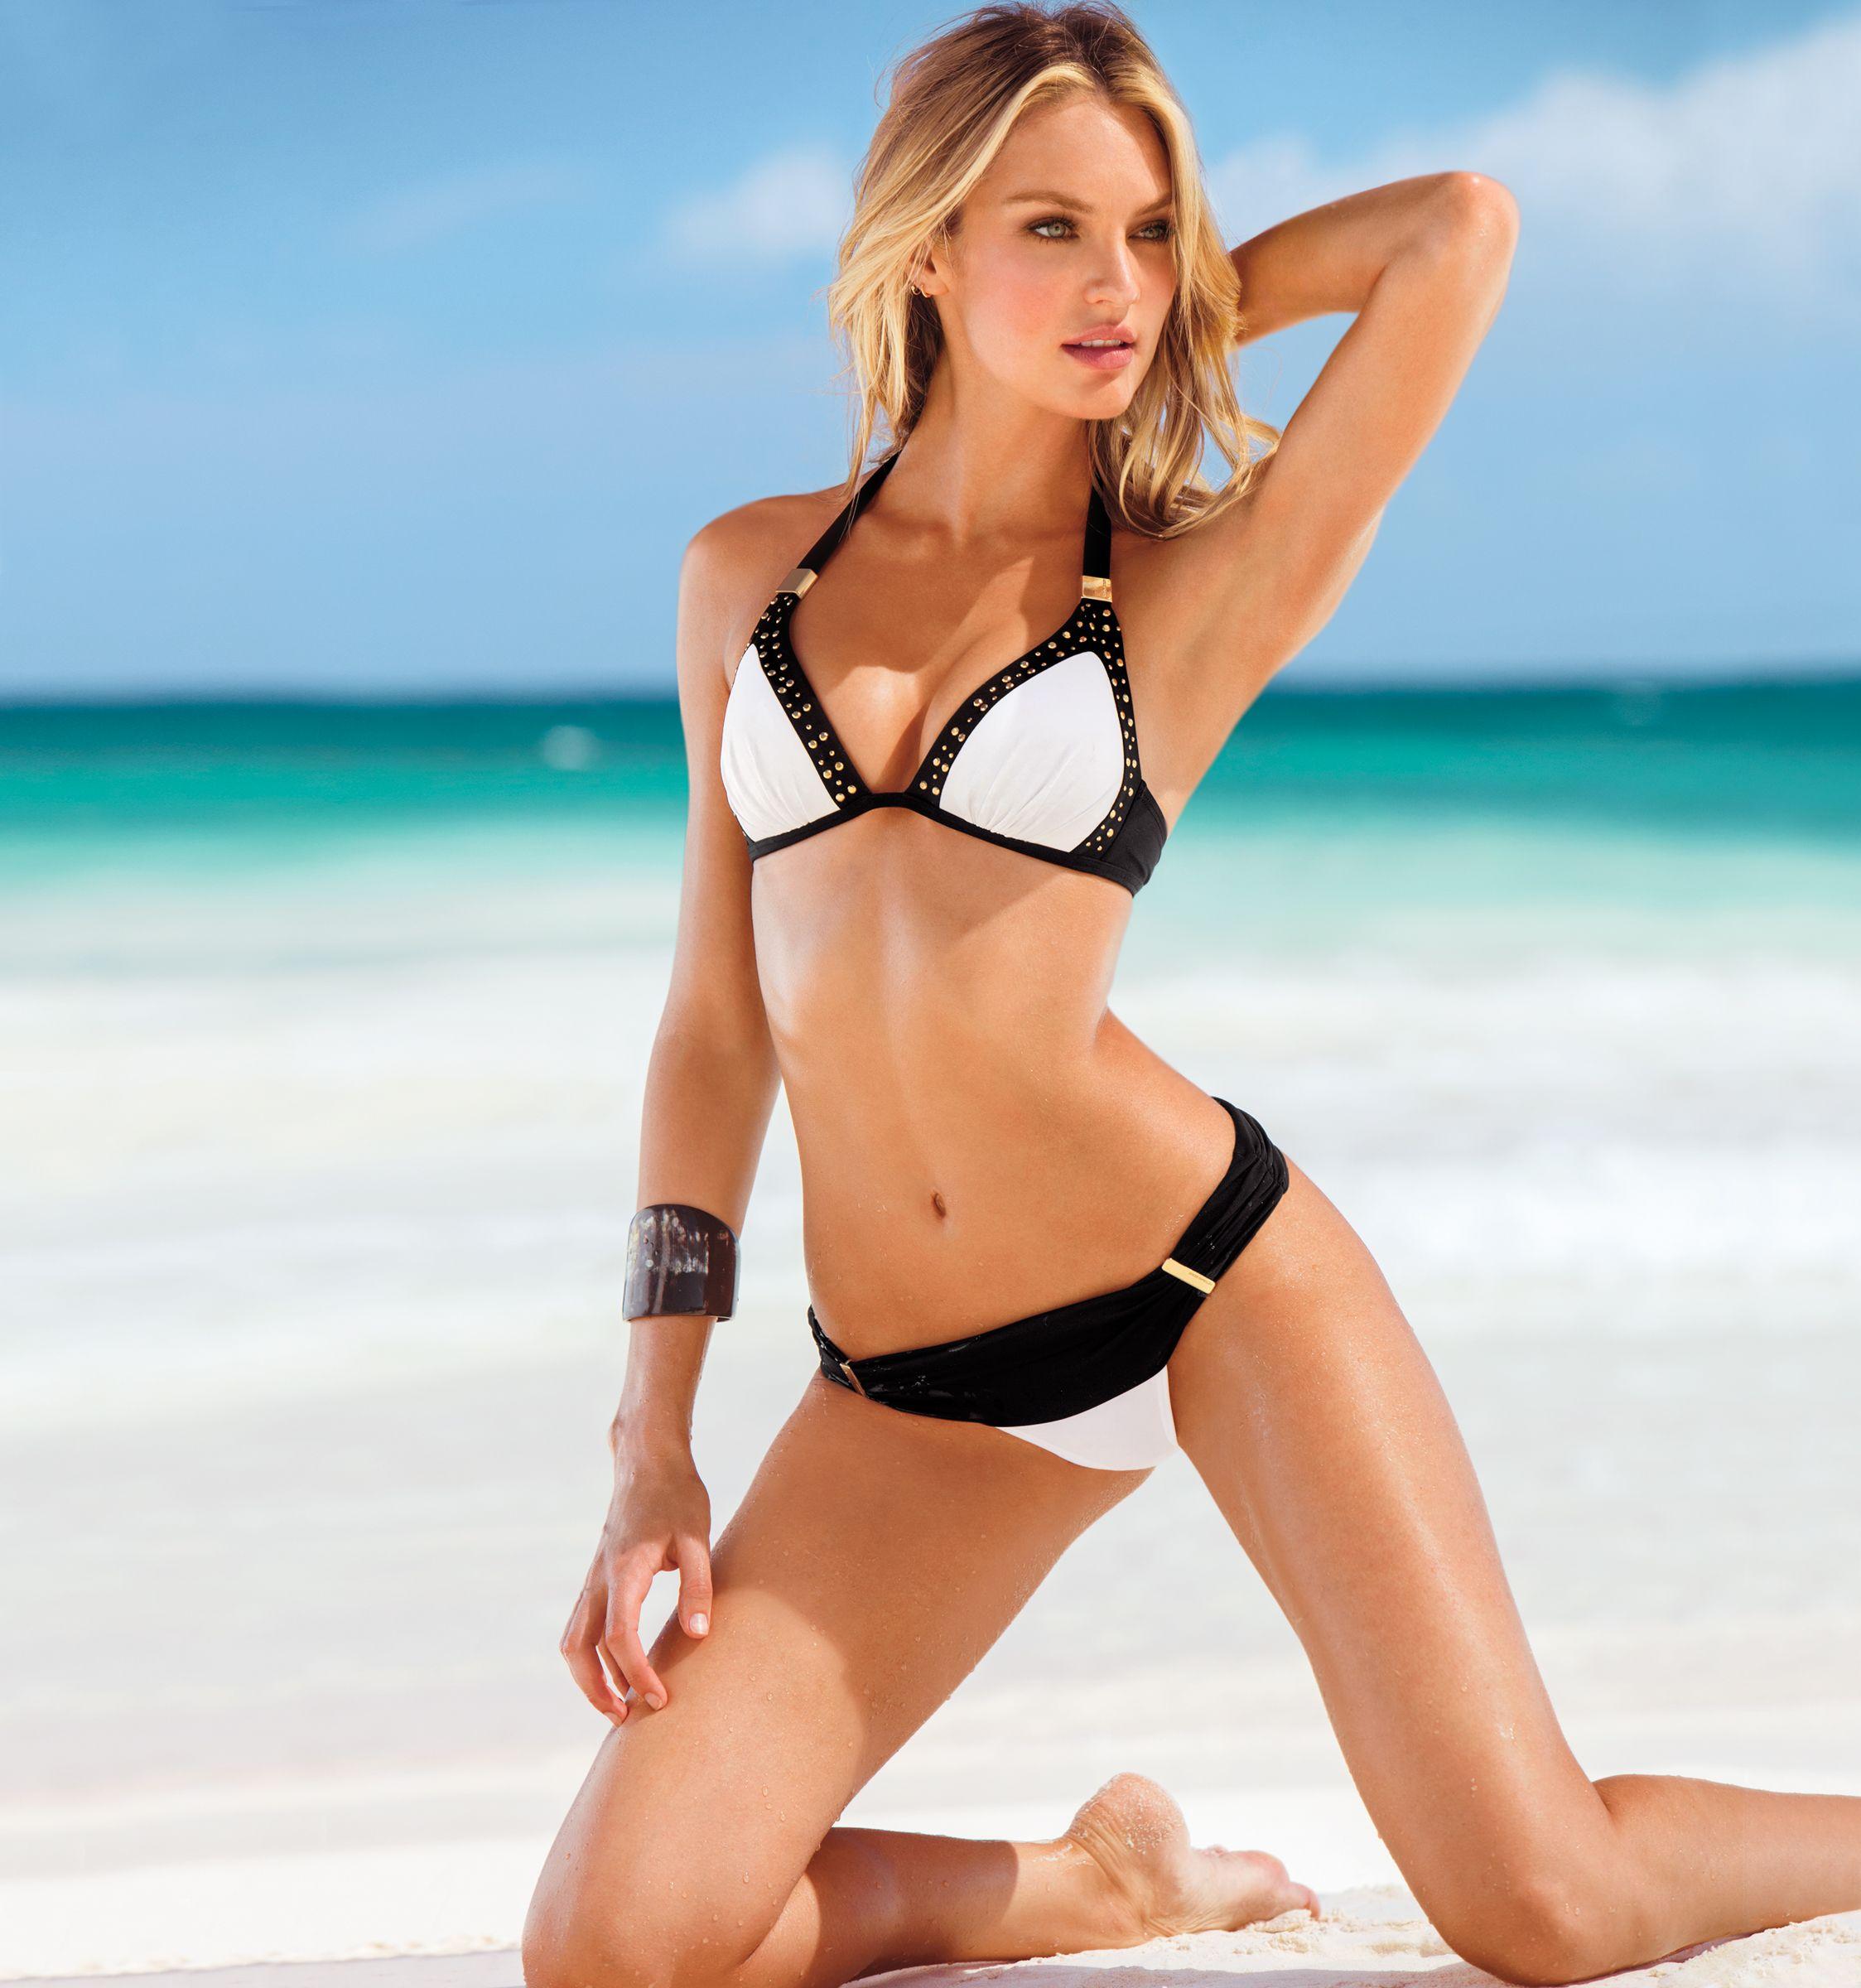 hi-res-bikini-beach-picture-asian-porn-movie-zones